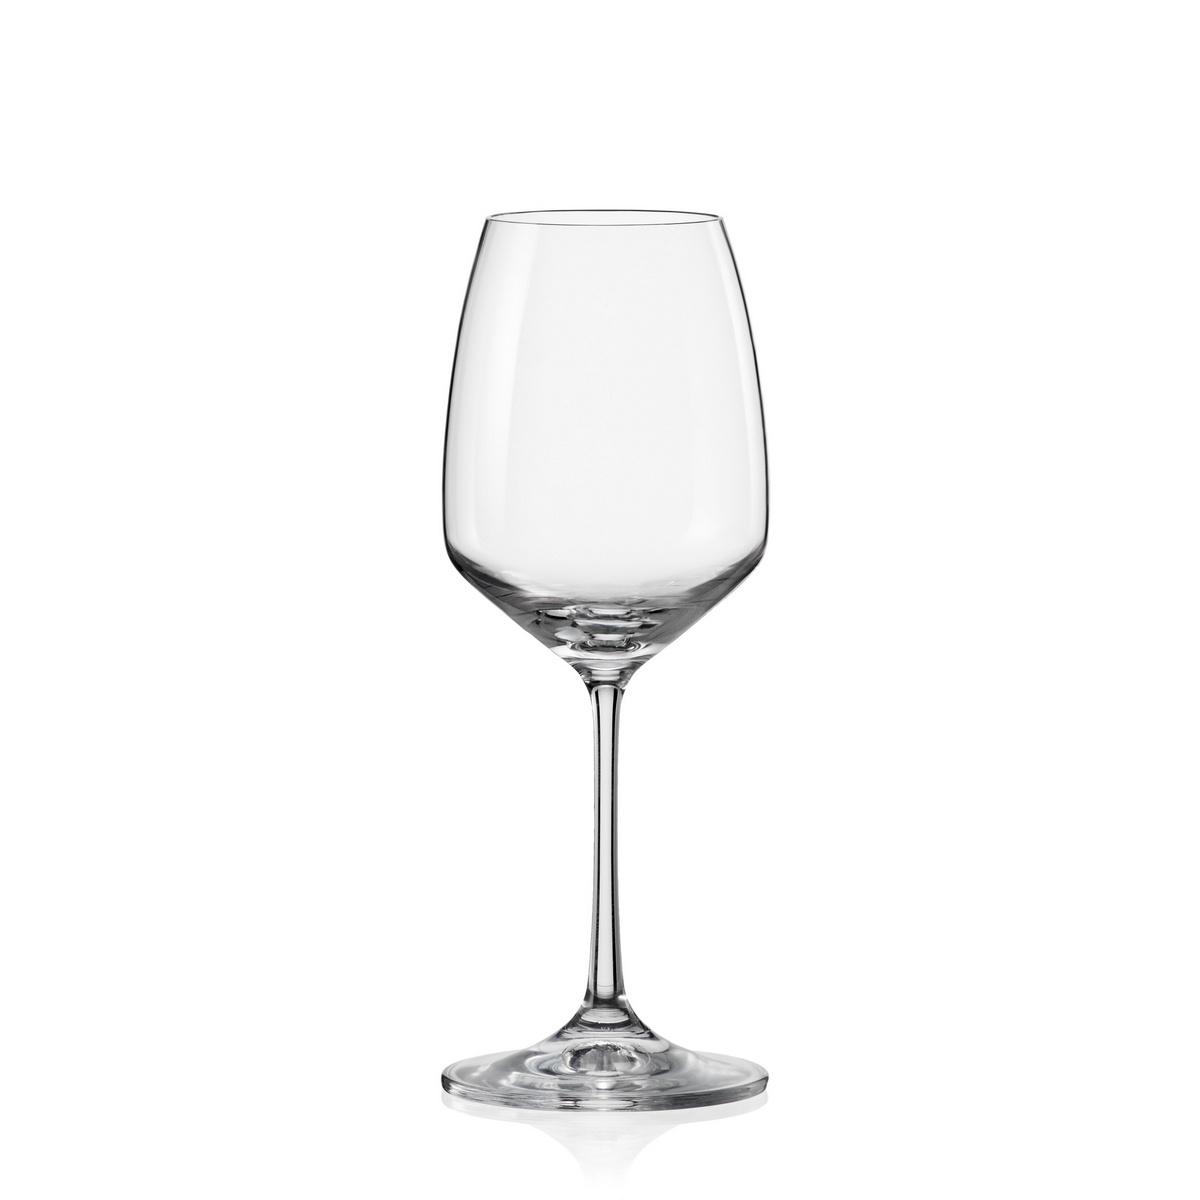 Crystalex 6dílná sada sklenic na víno GISELLE, 340 ml